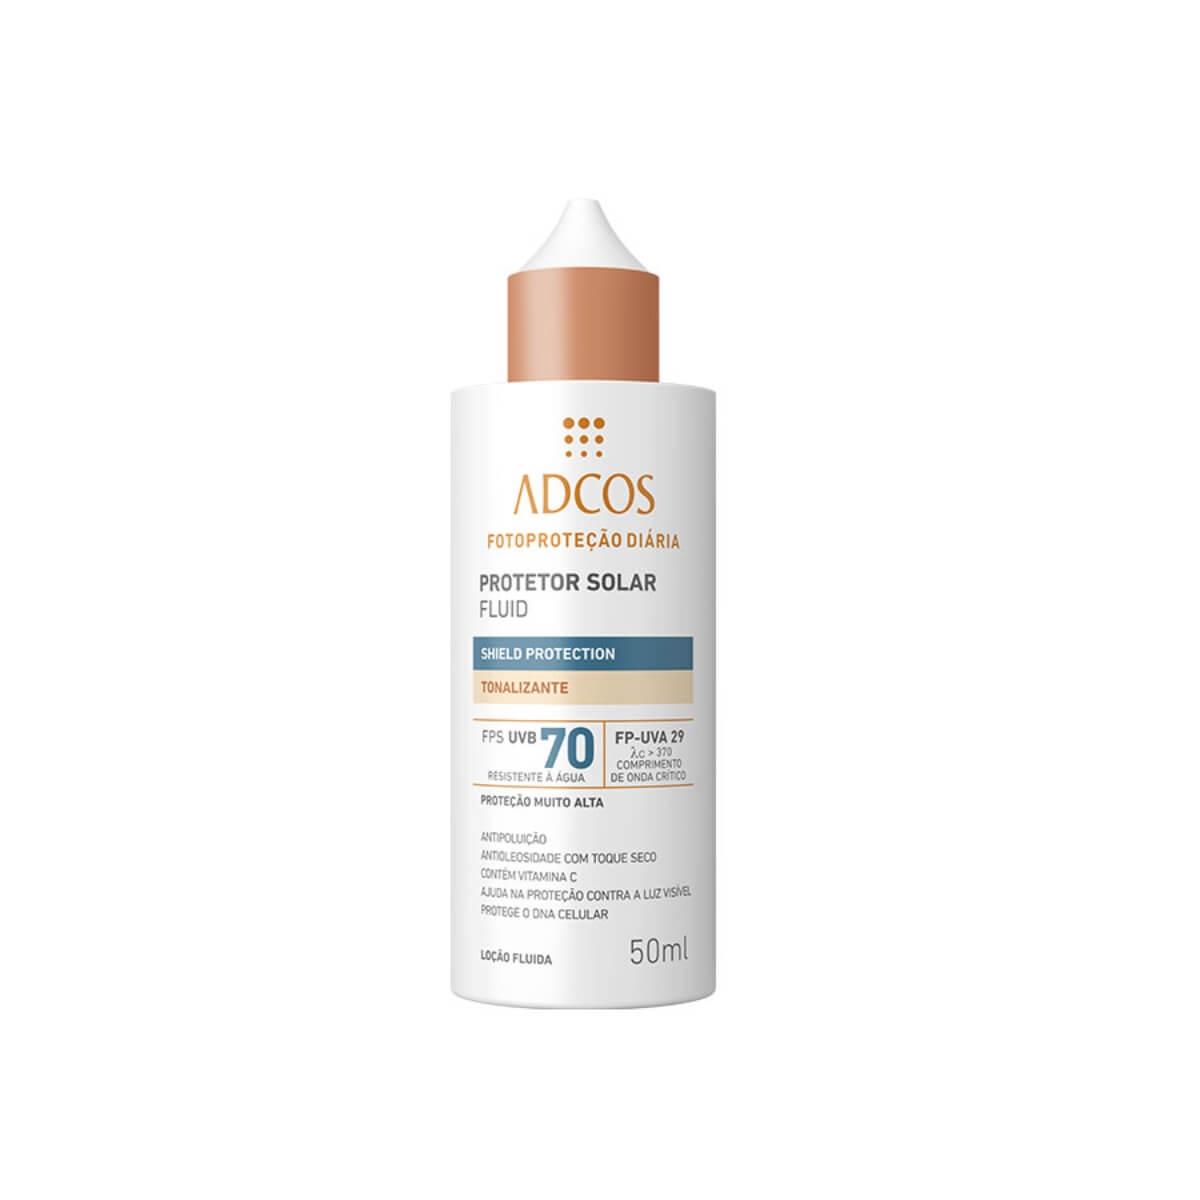 Protetor Solar Facial Adcos Fluido Tonalizante Shield Protection FPS70 50ml